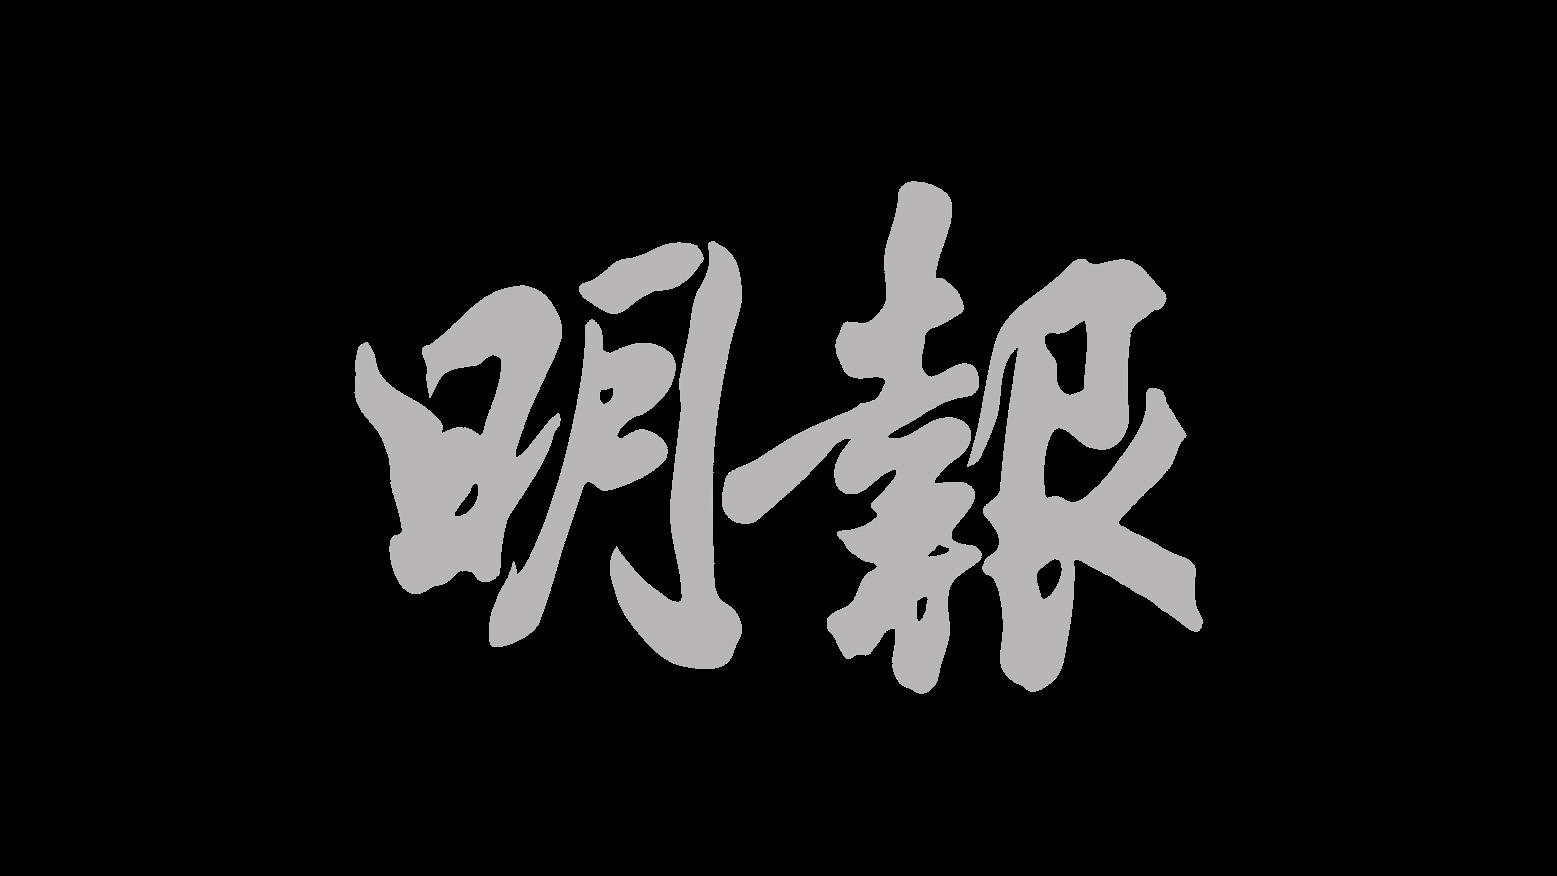 明報 Mingpao